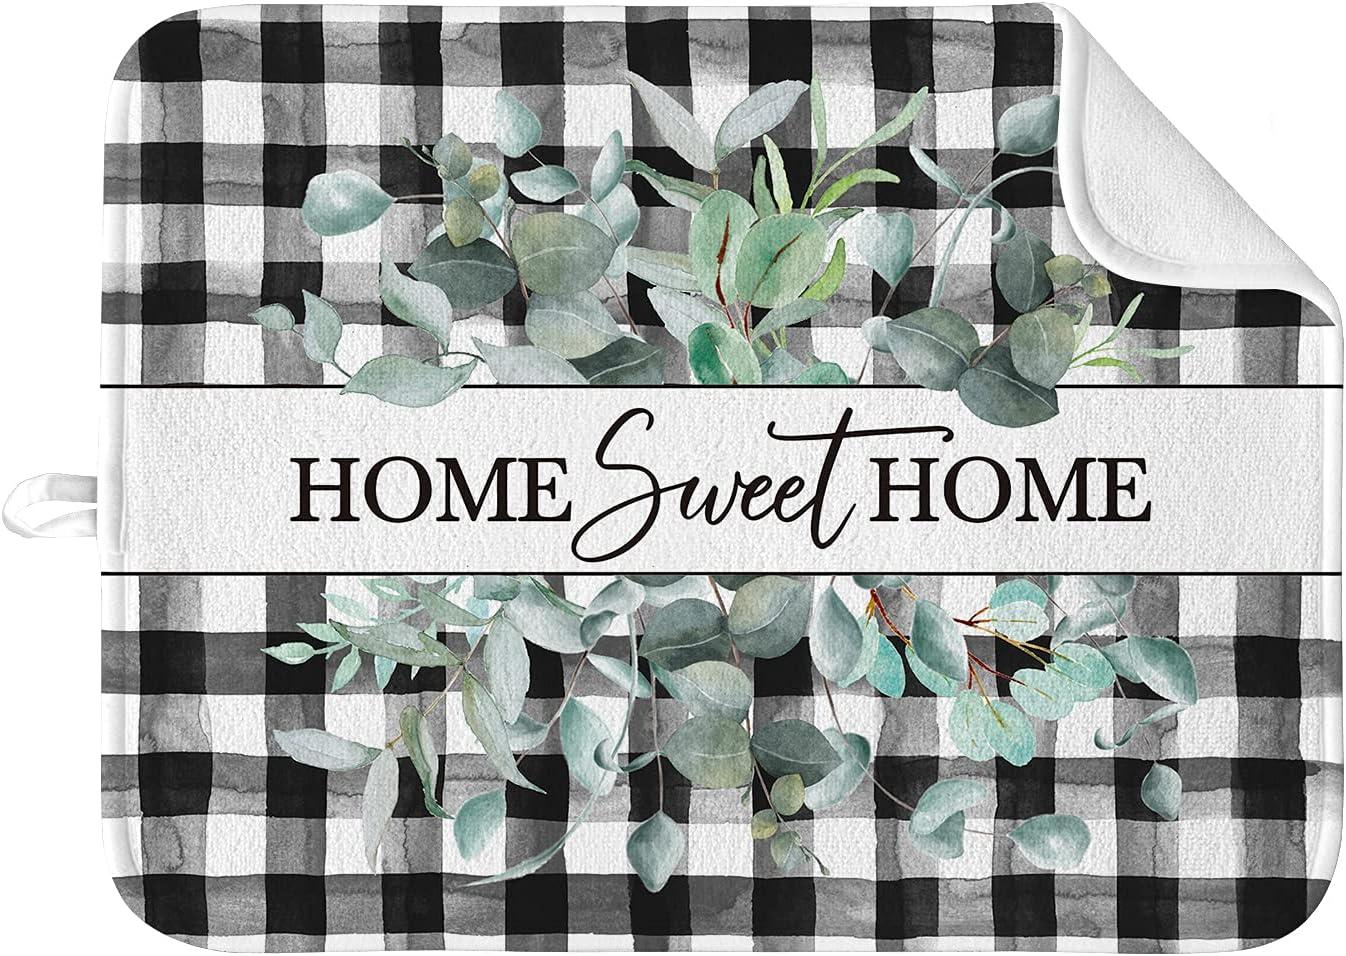 Artoid Mode Buffalo Plaid Limited time cheap sale Home Sweet Drying Eucalyptus Los Angeles Mall Mat